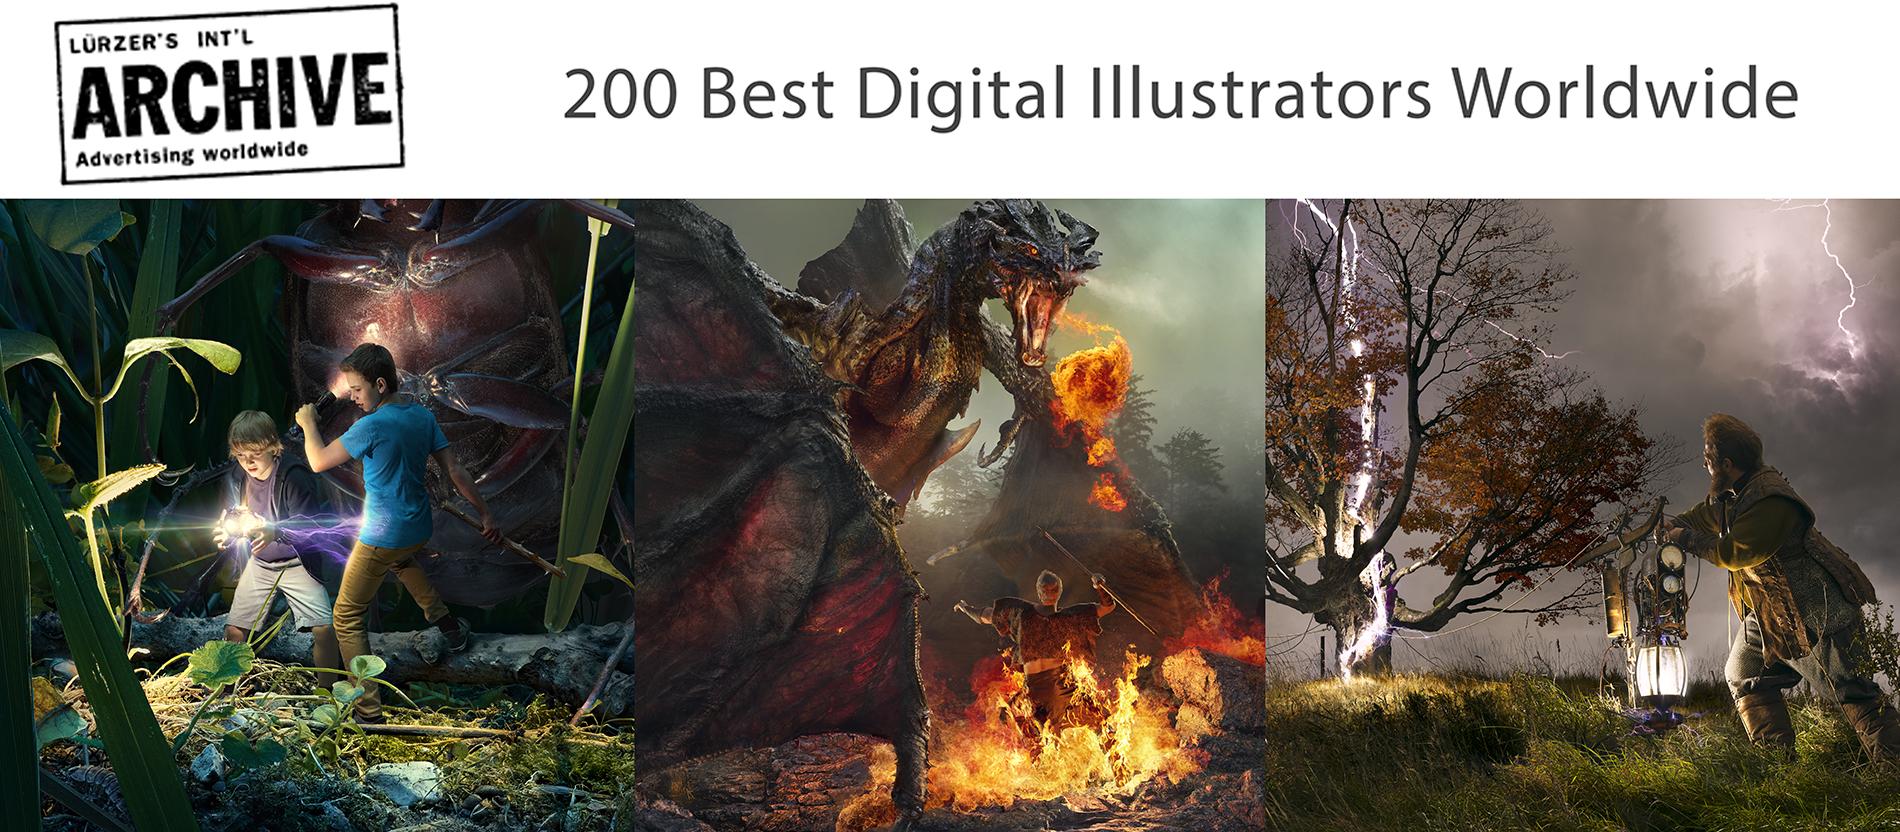 blog-200 best